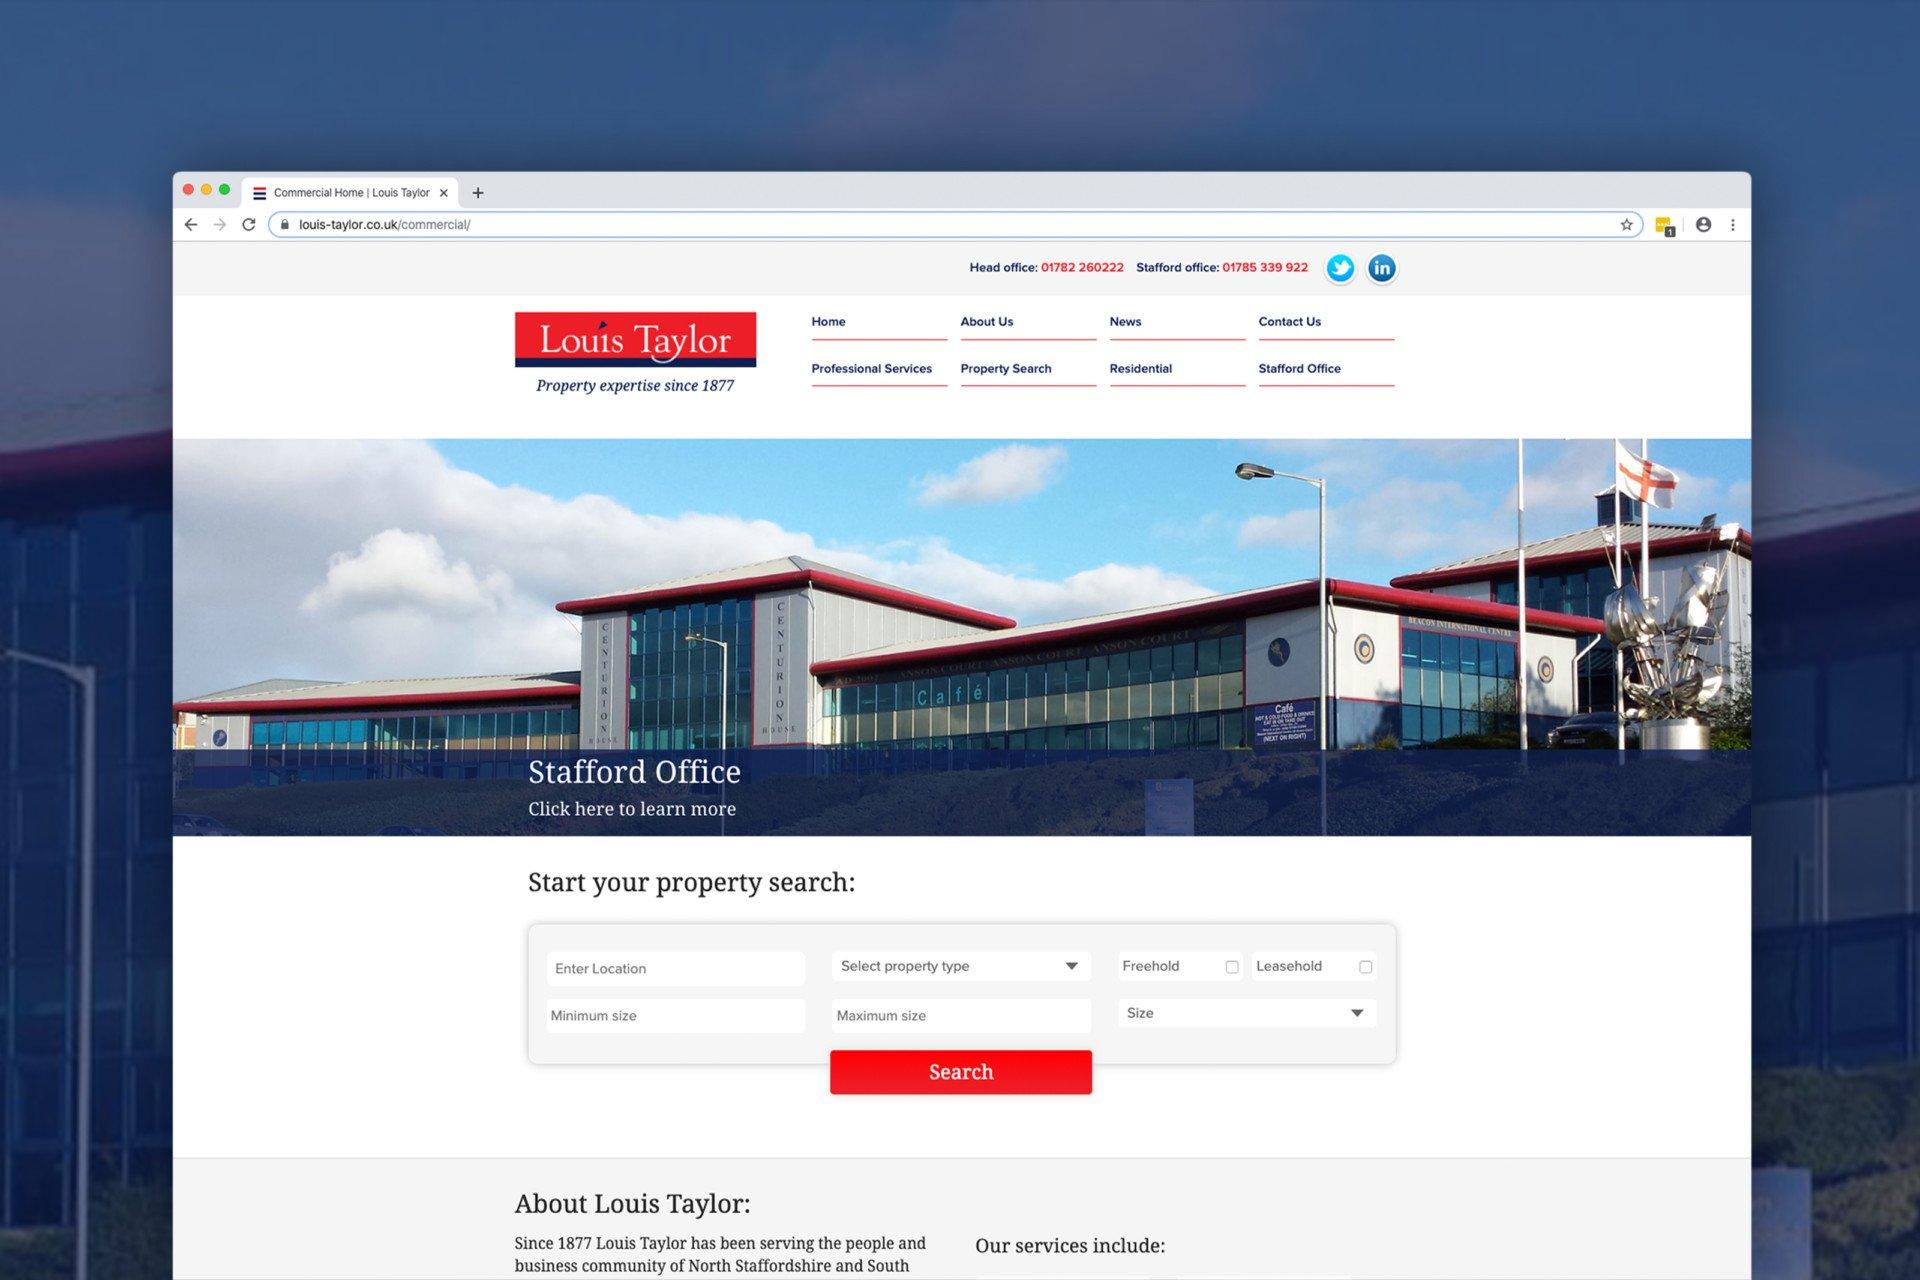 Louis Taylor Website Design